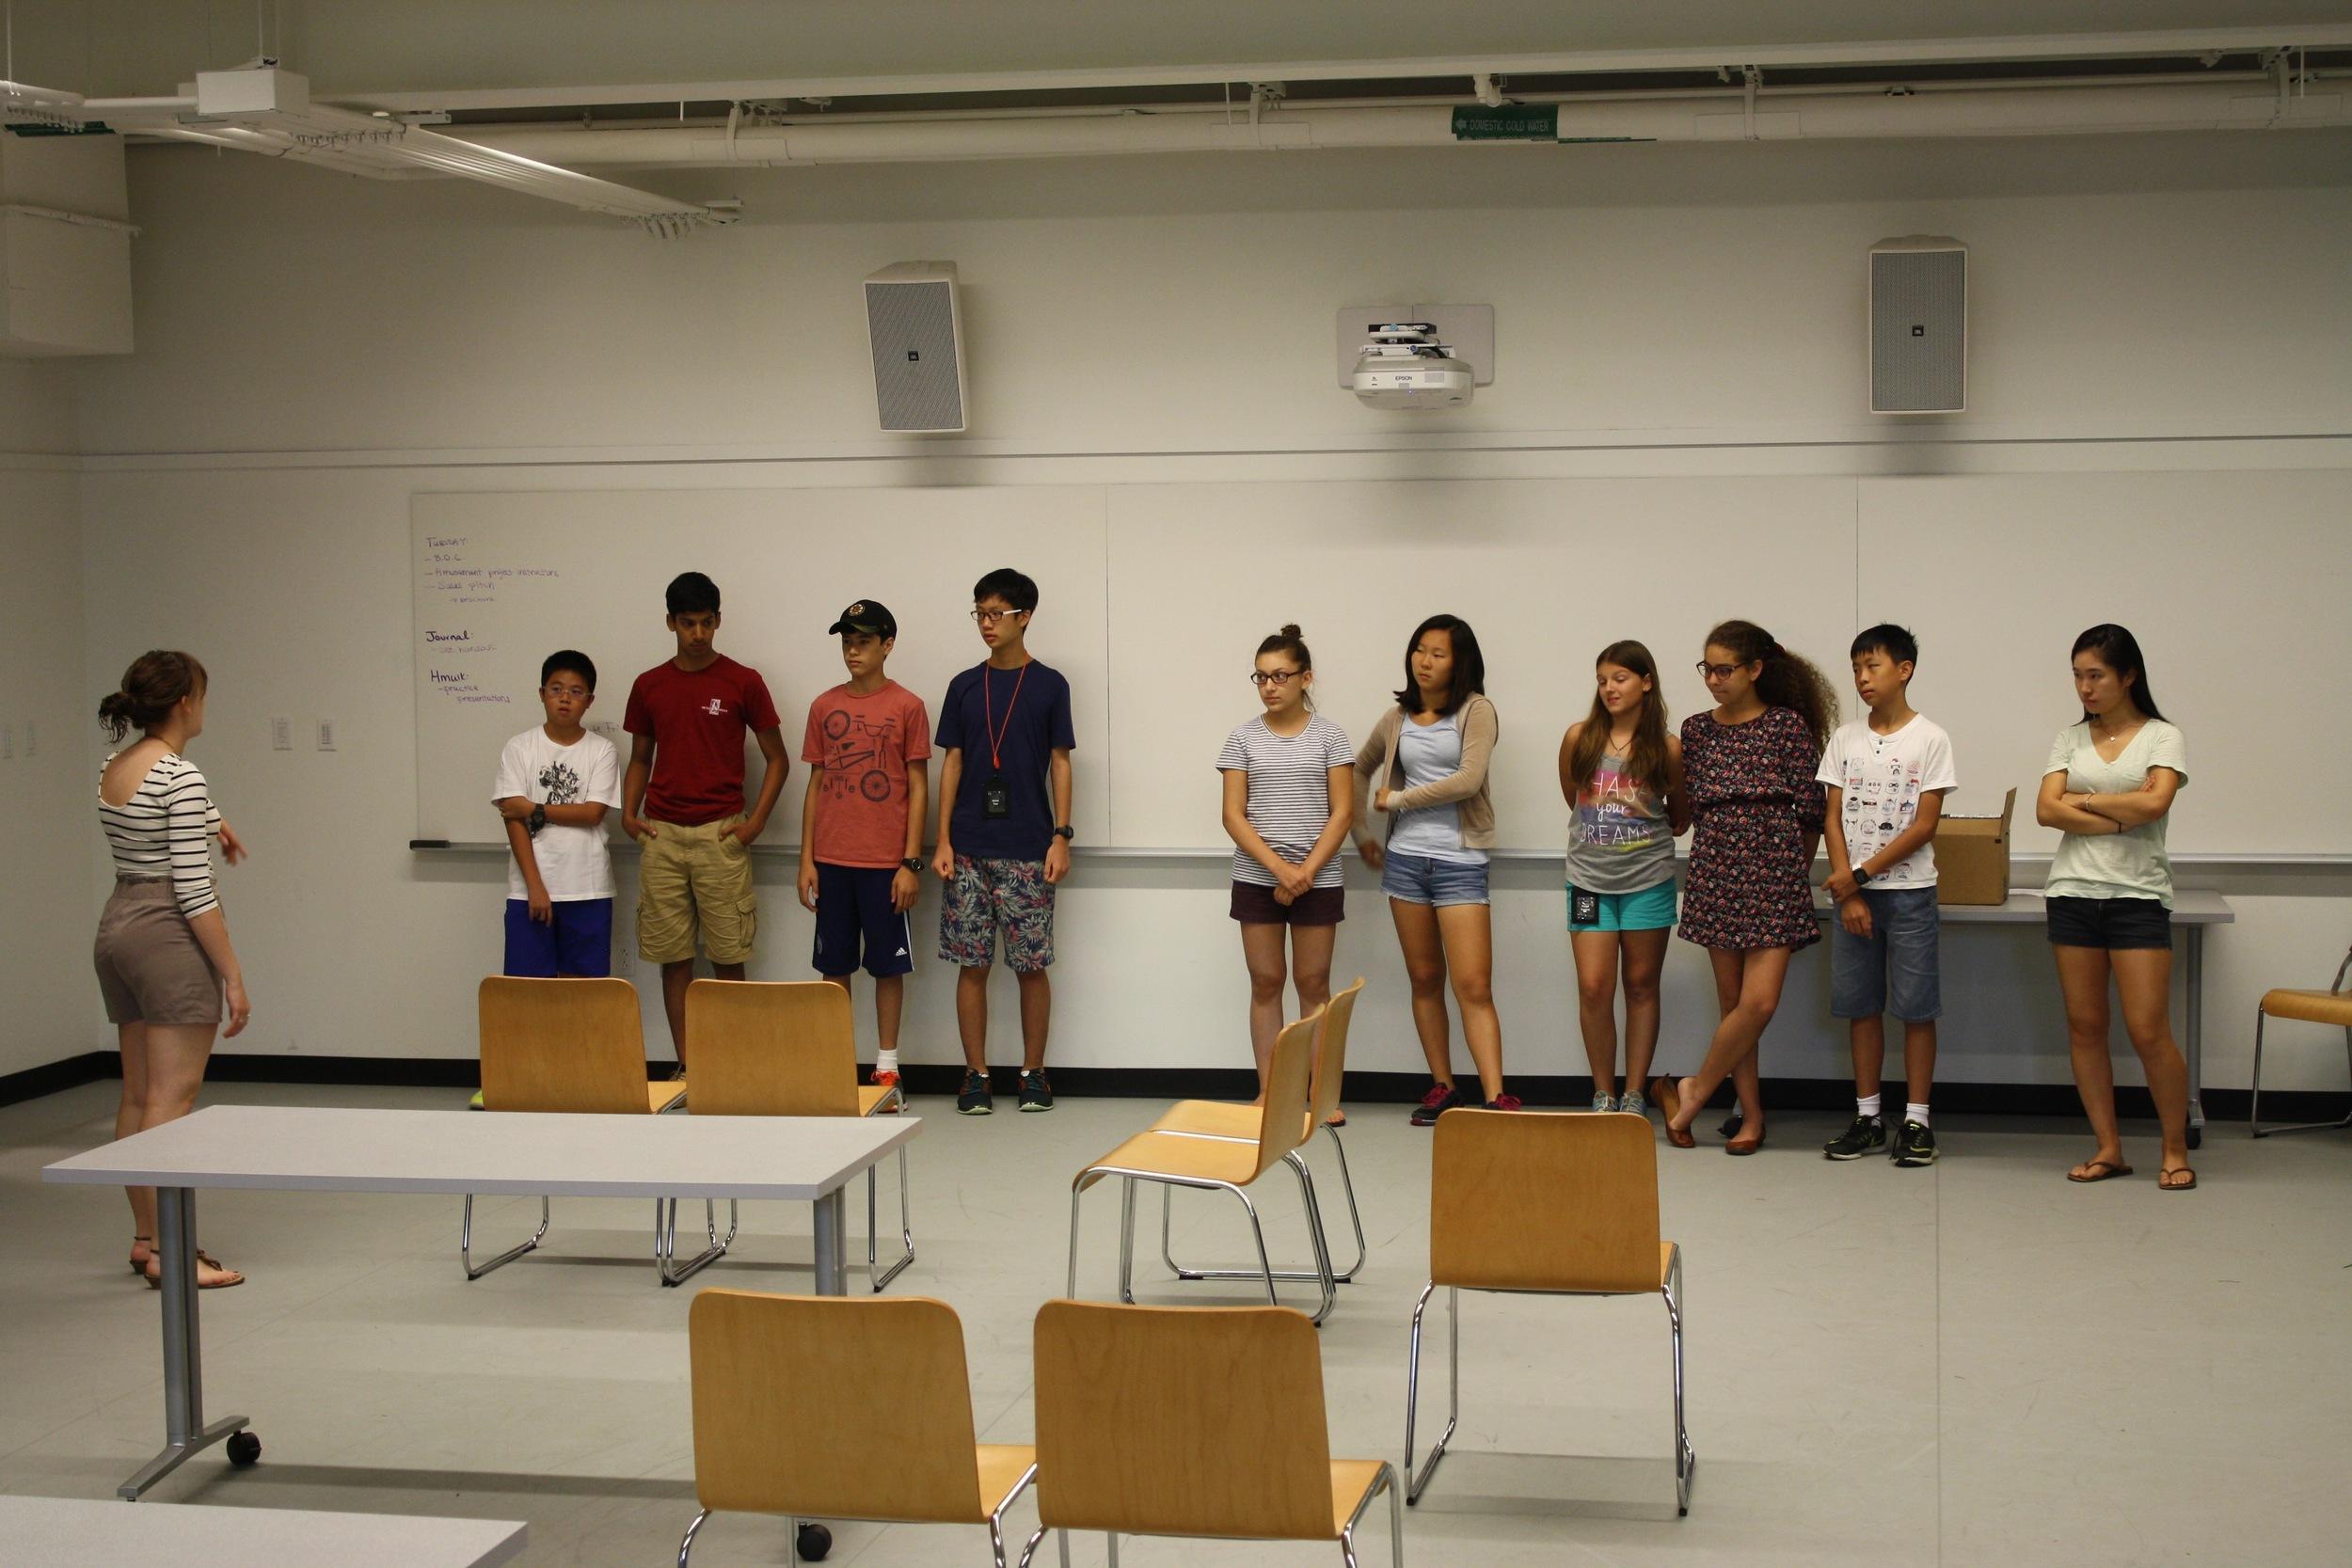 Drama-based warm-ups at the Experimentory